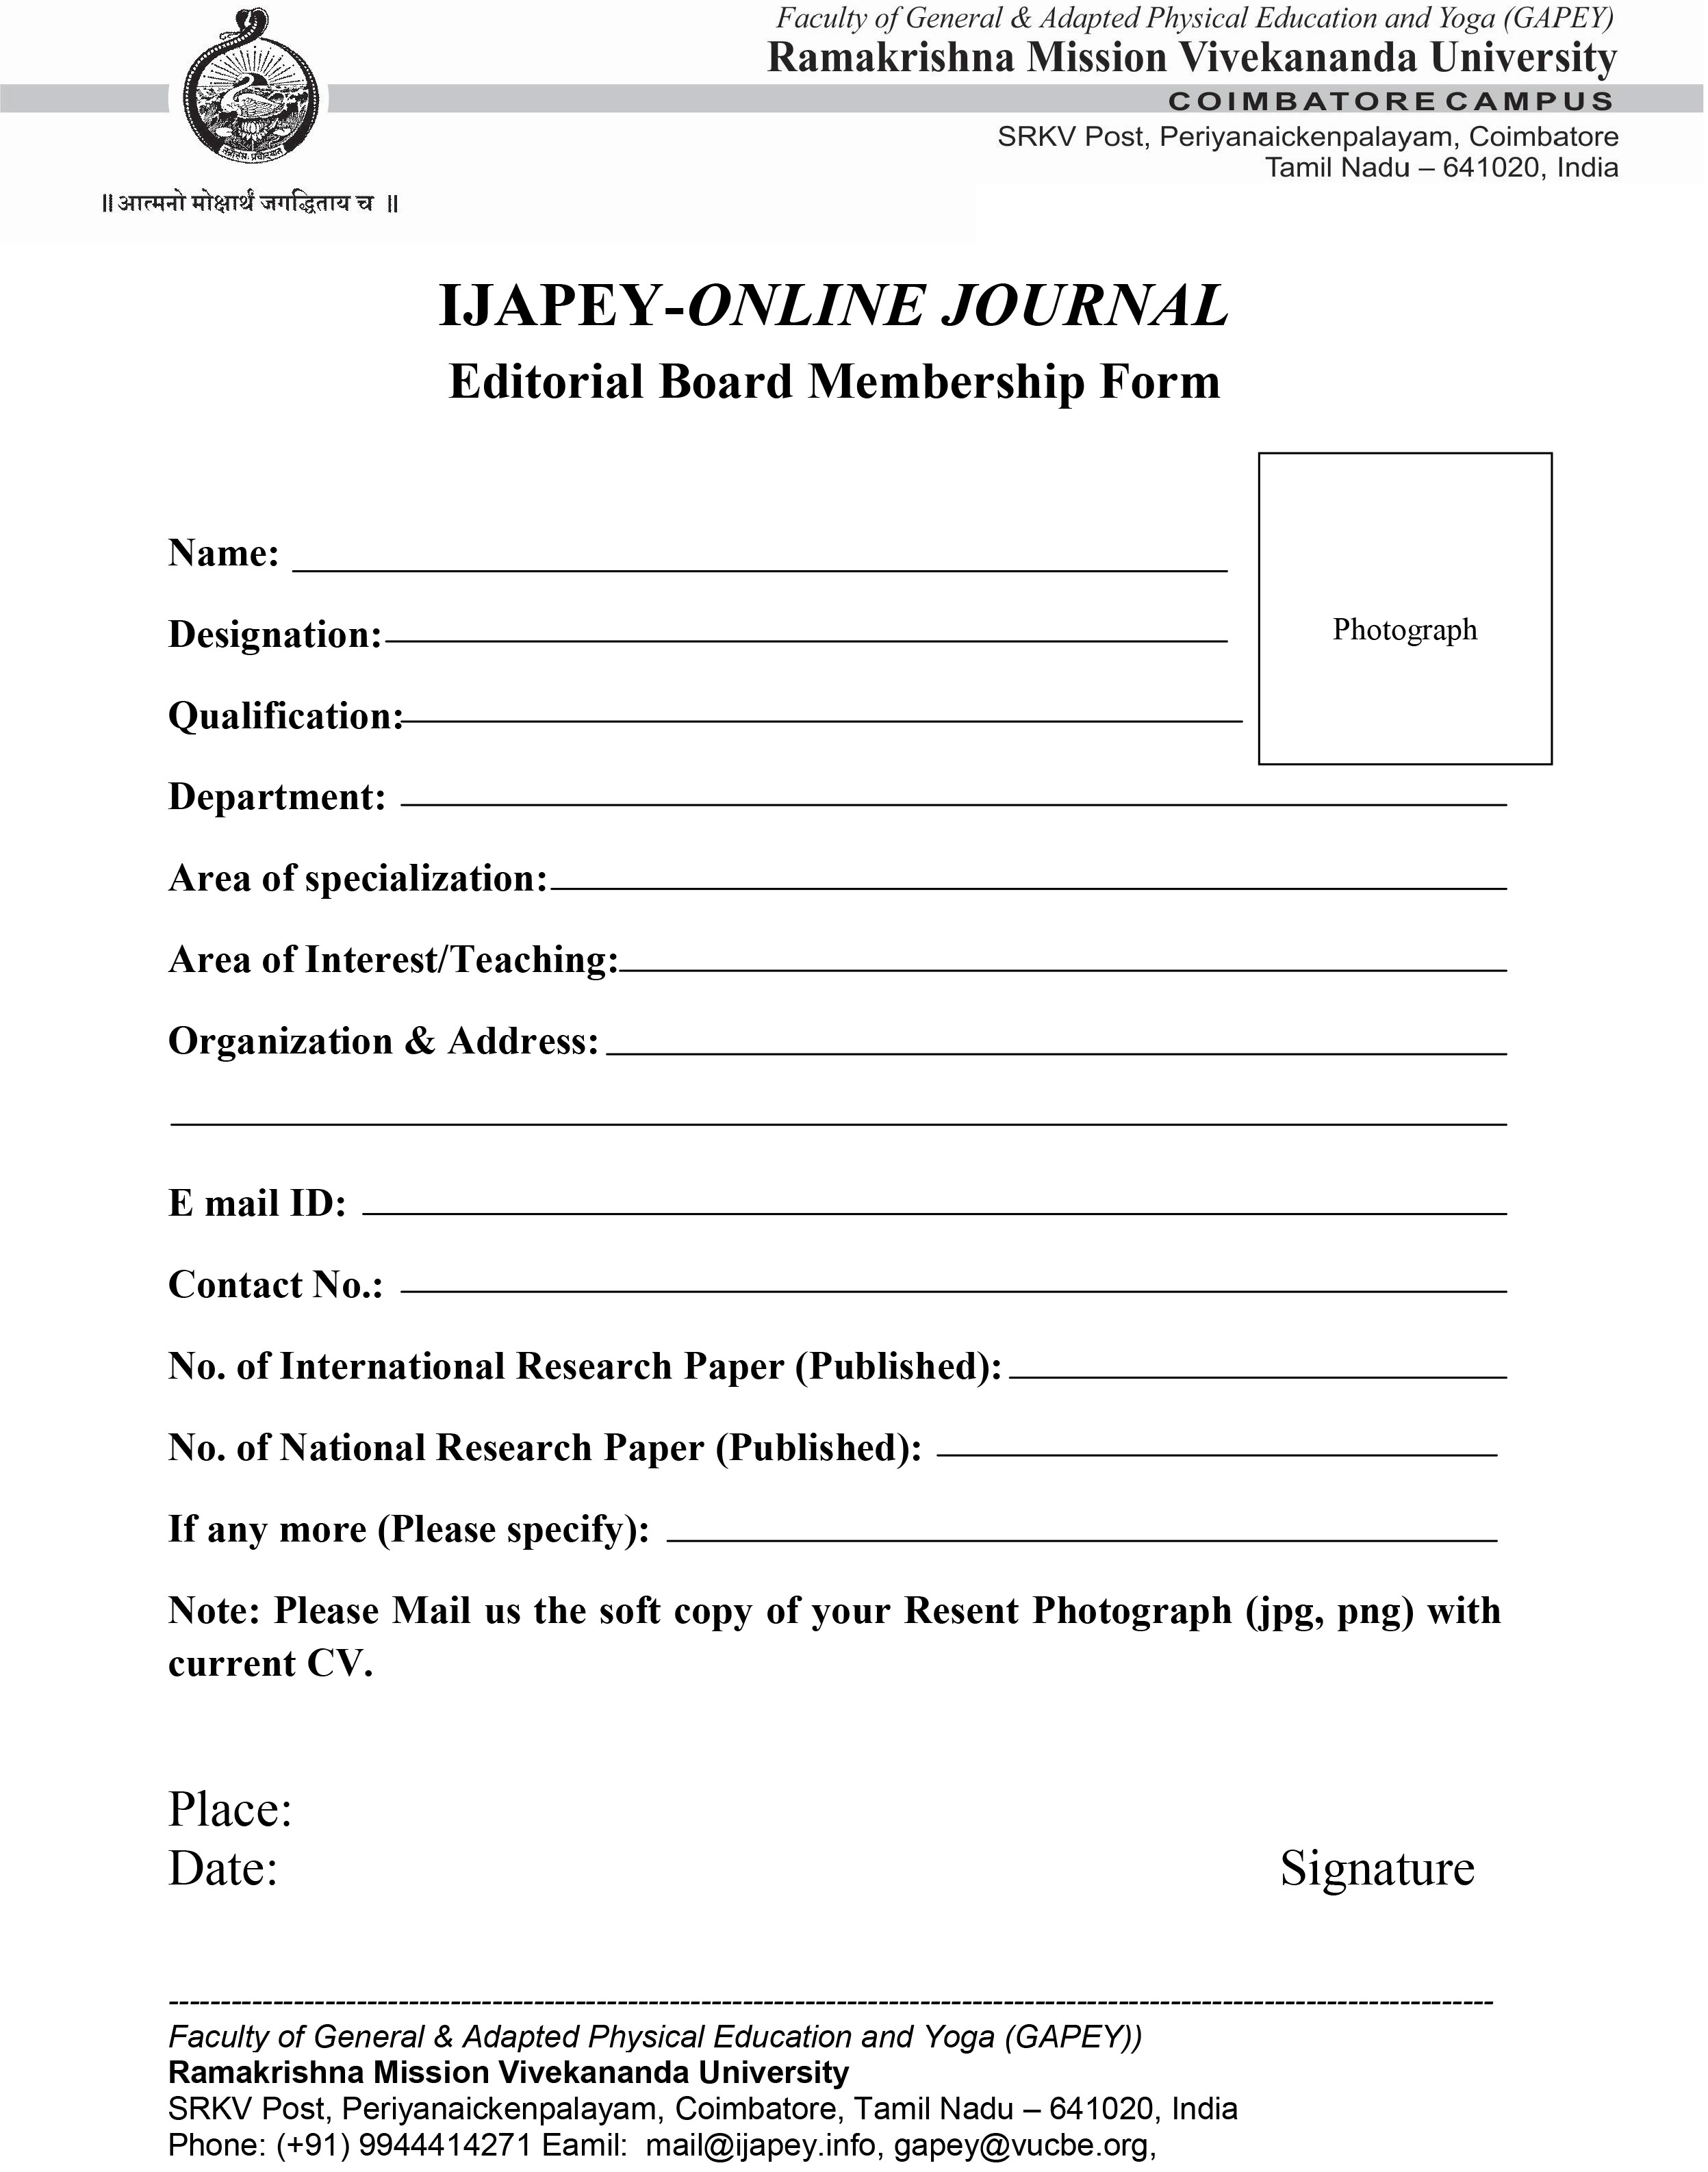 Microsoft Word - ijoapey-Editorial Board Membership Form.docx